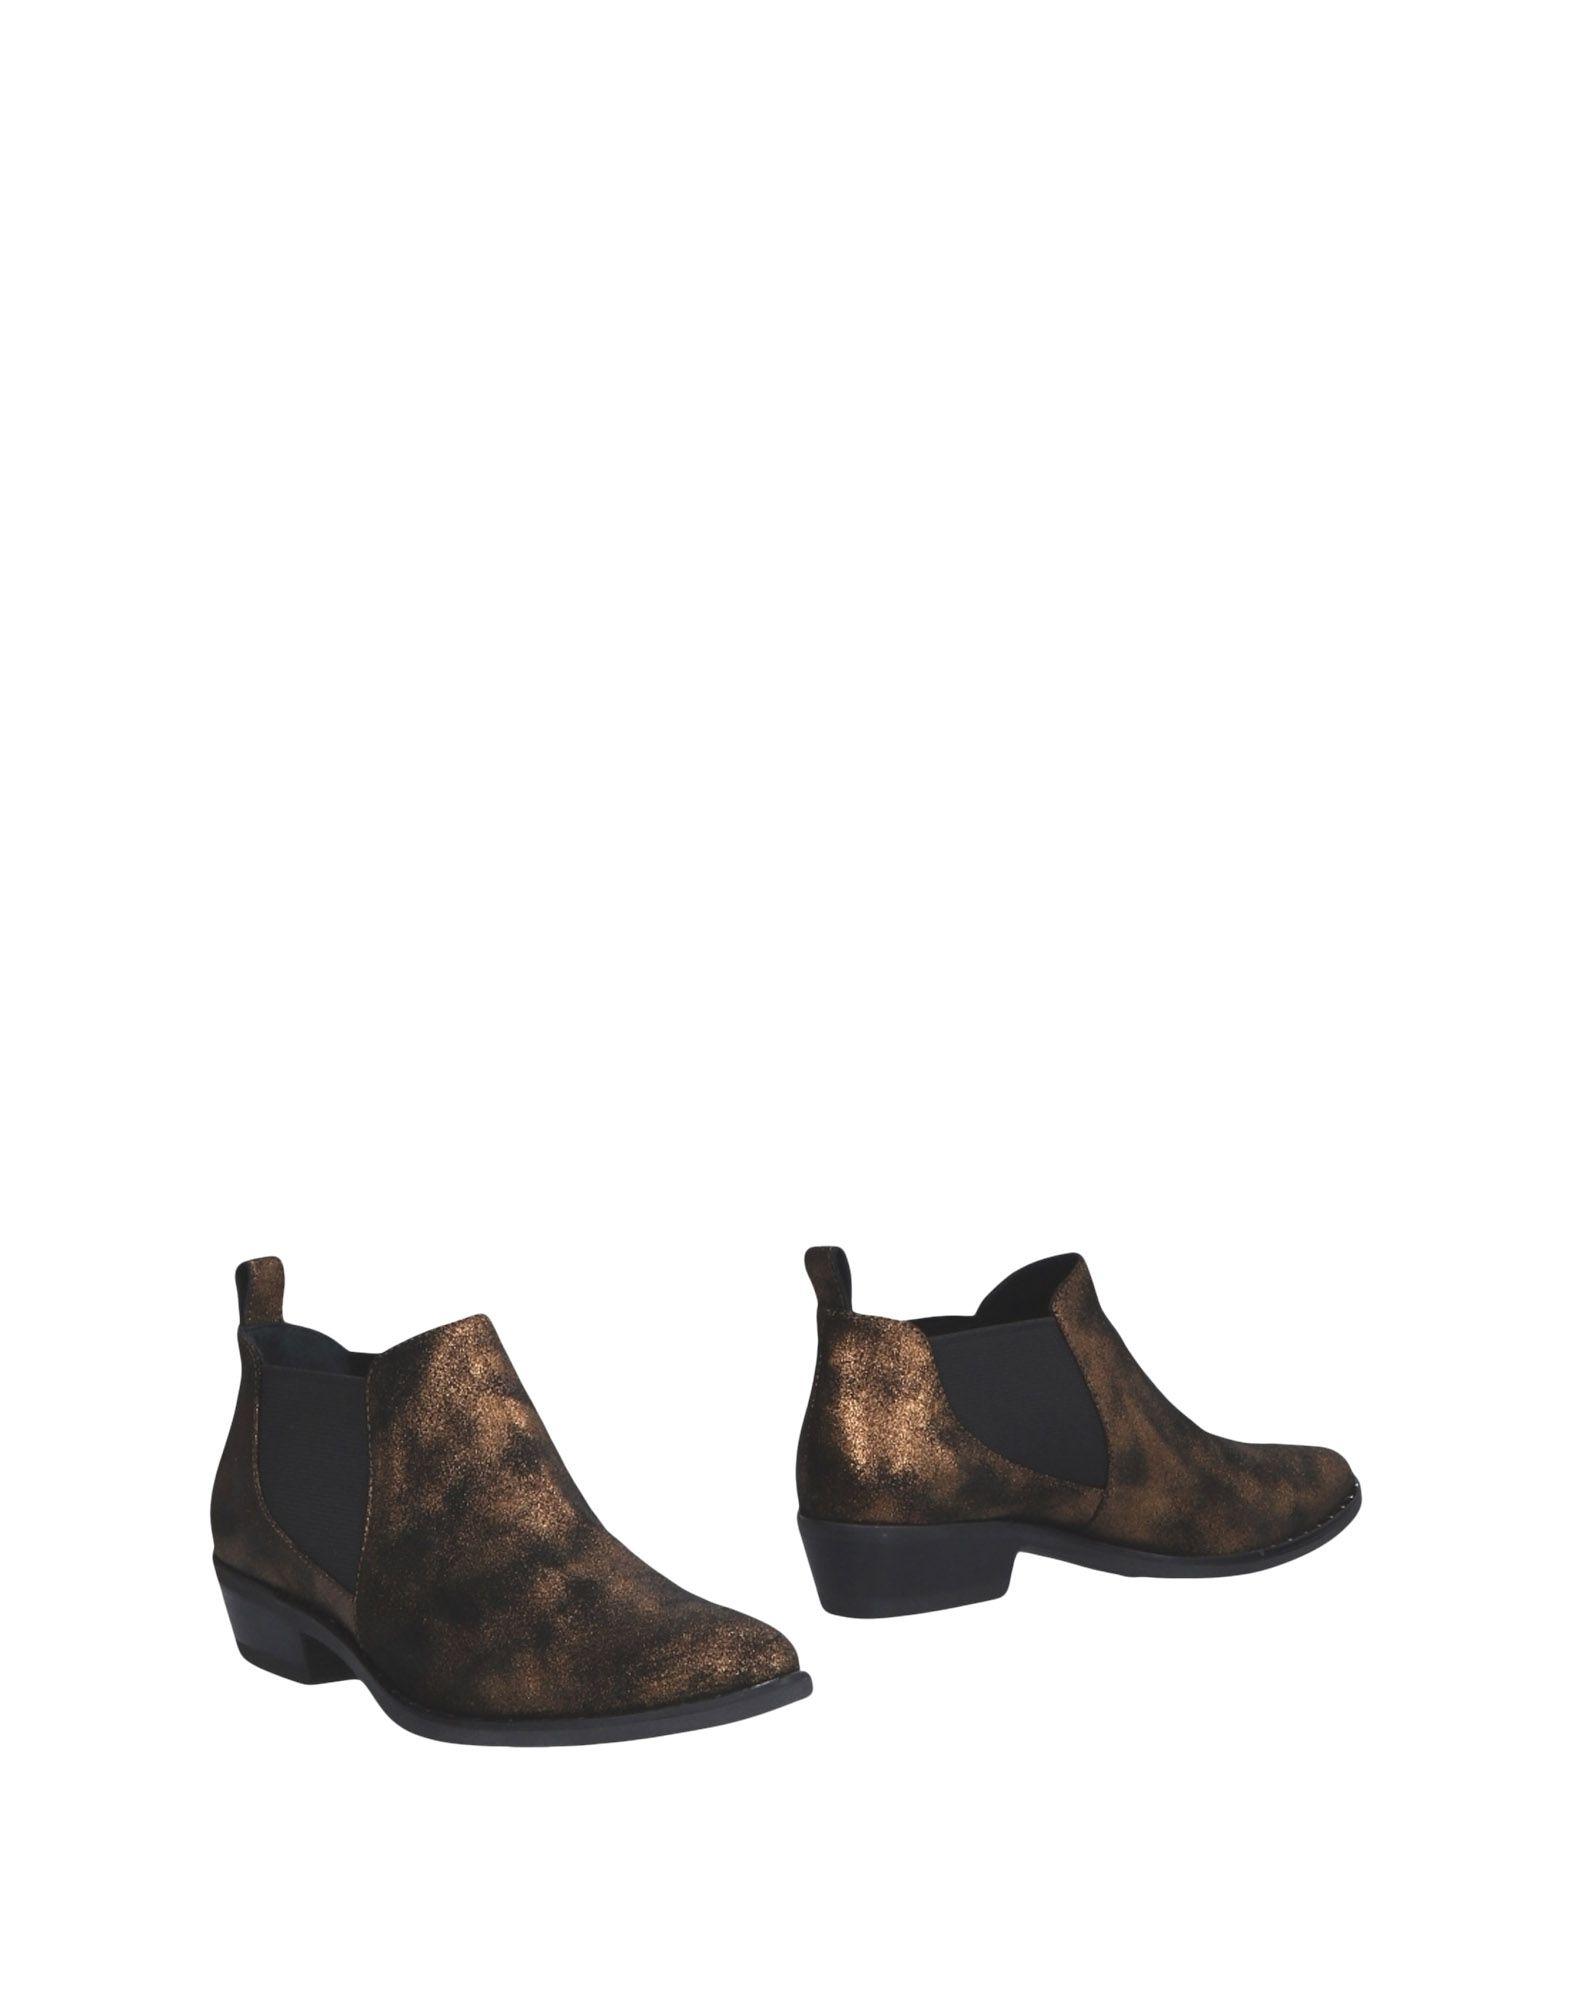 Gut Paoli um billige Schuhe zu tragenGiancarlo Paoli Gut Stiefelette Damen  11475408TN f1bdac